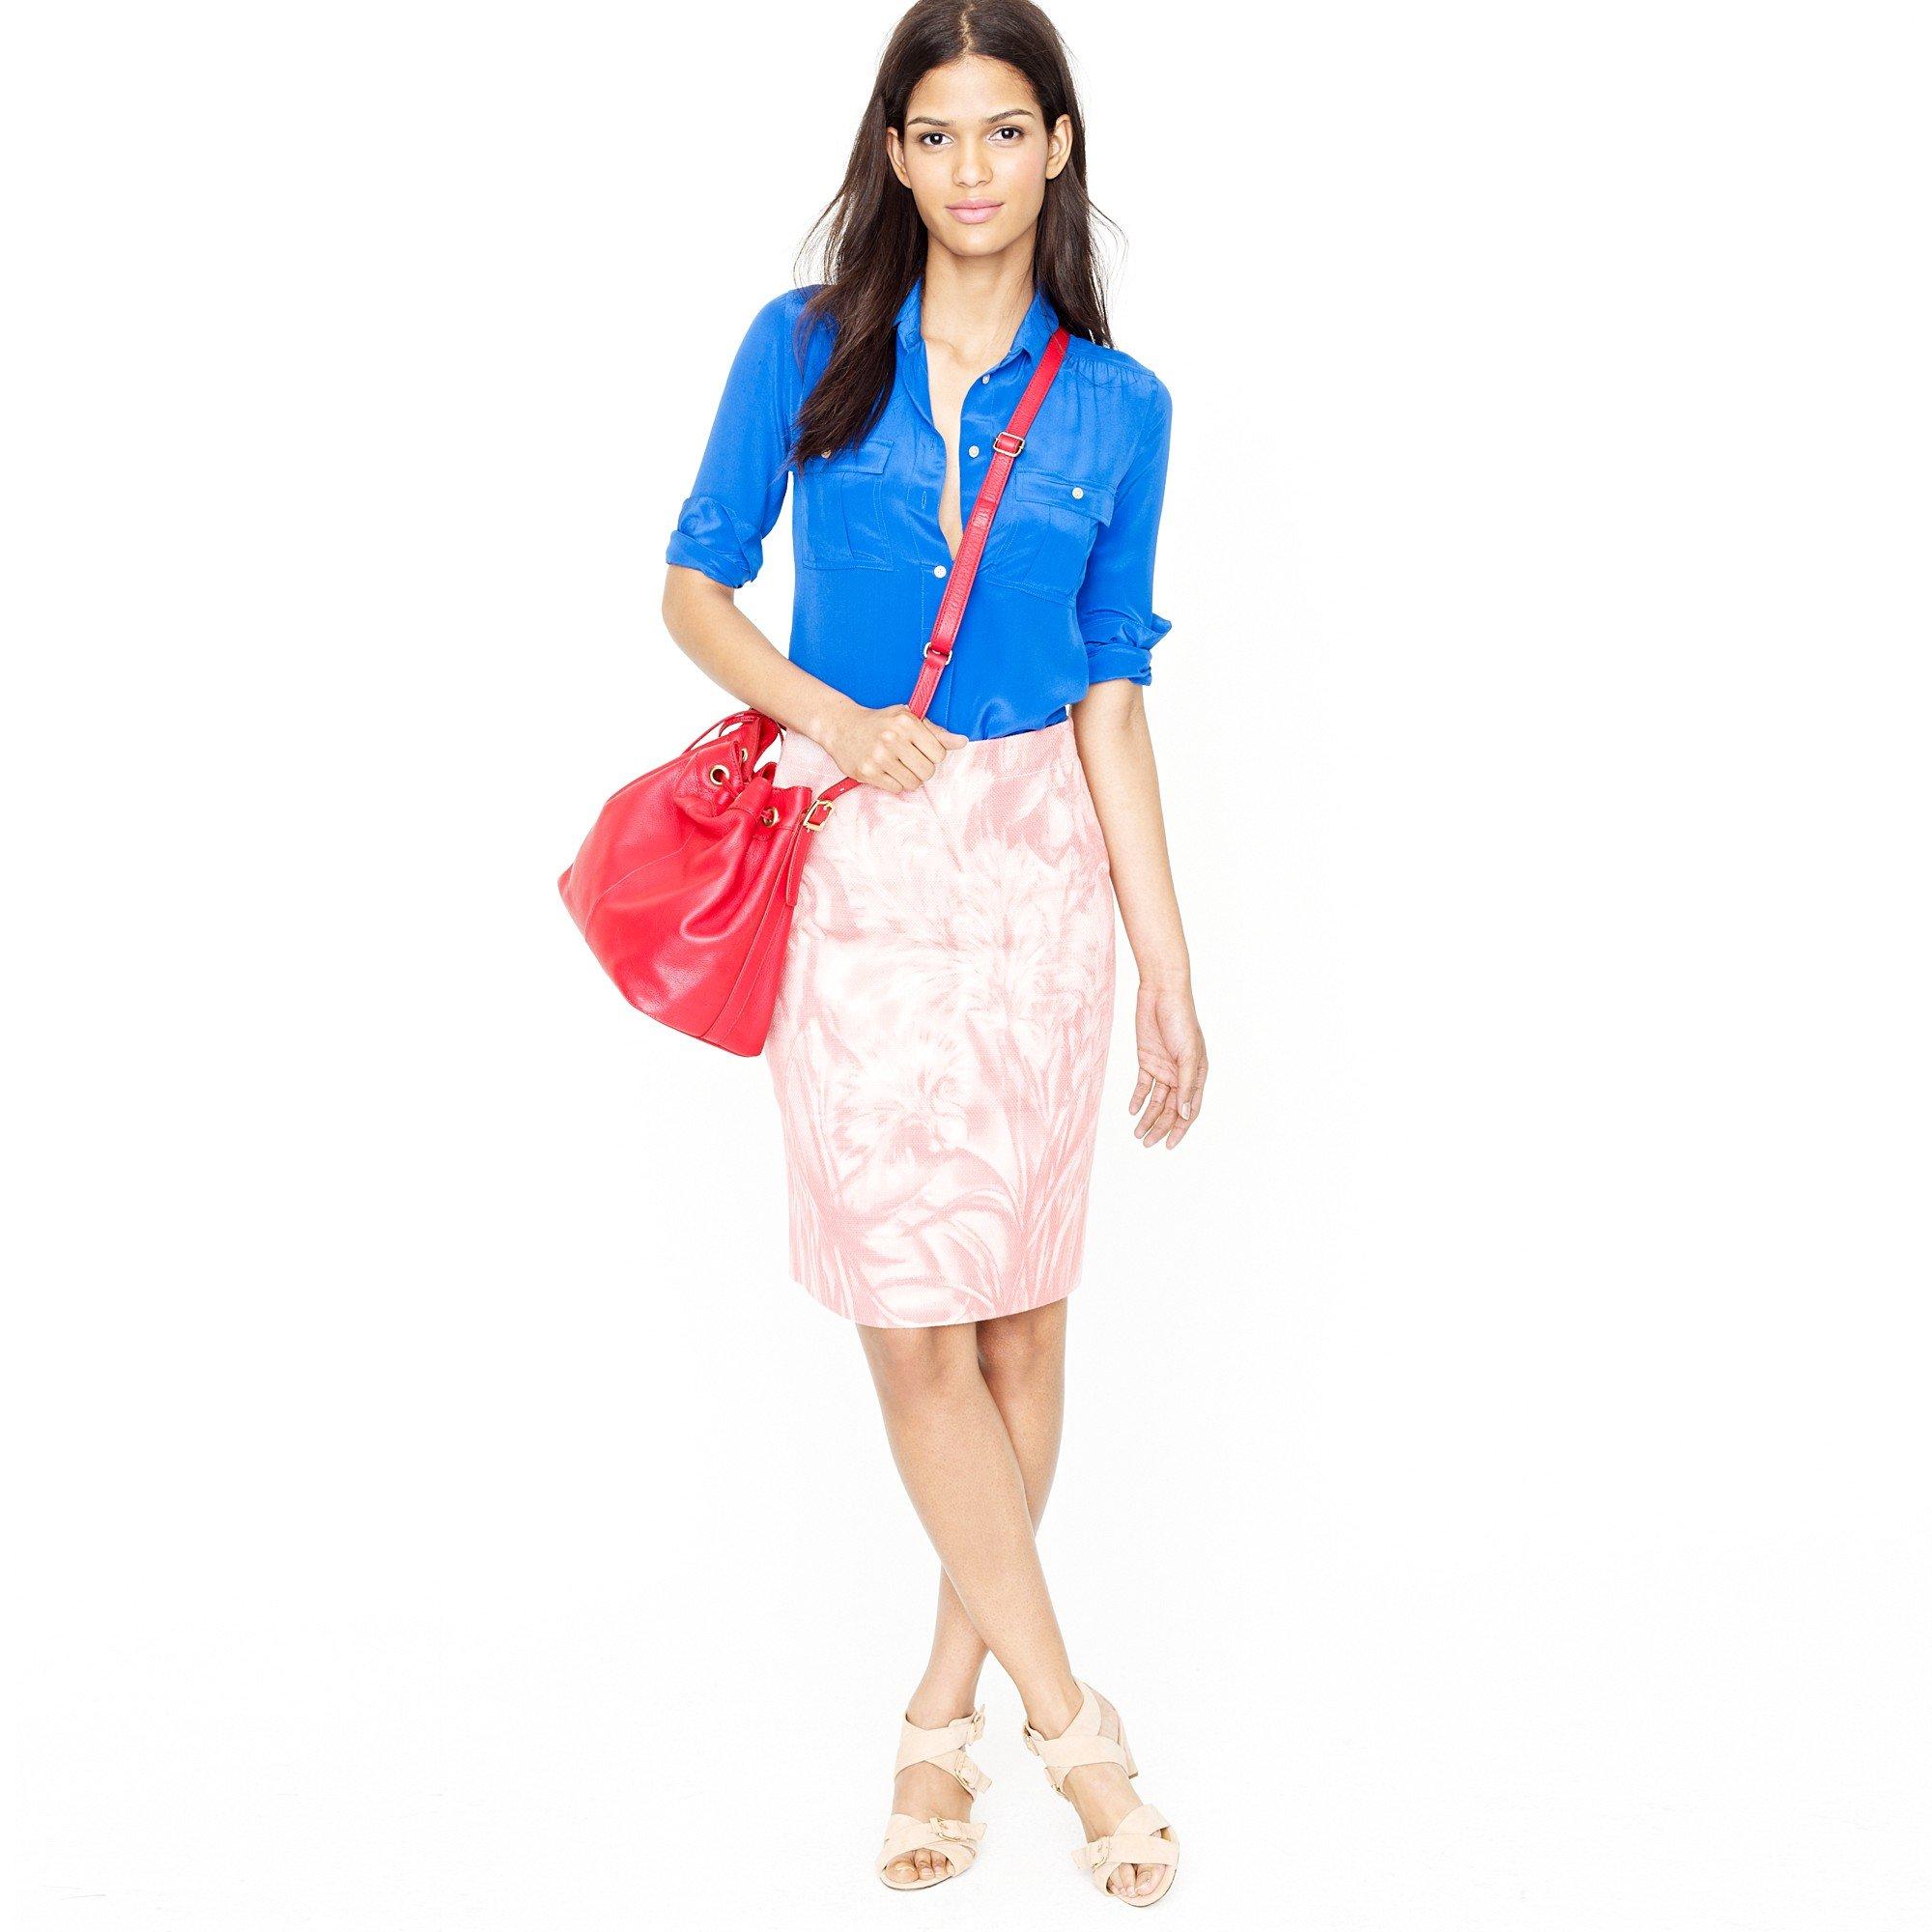 j crew no 2 pencil skirt in waterfloral in pink